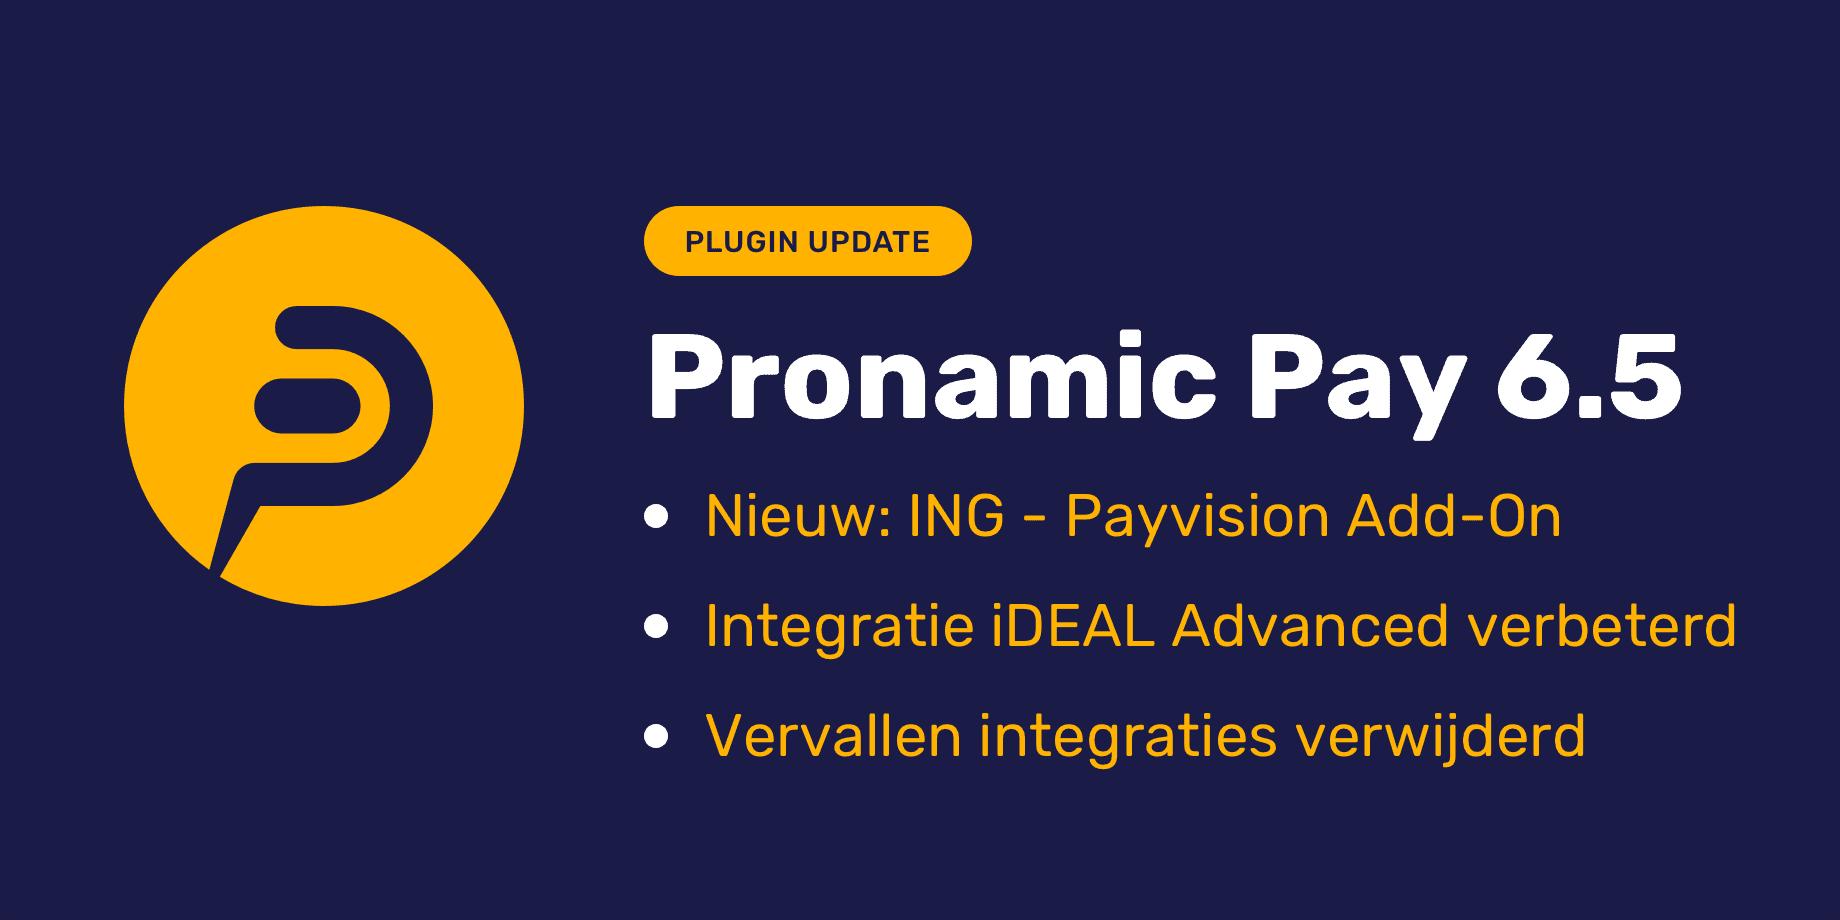 Pronamic Pay 6.5